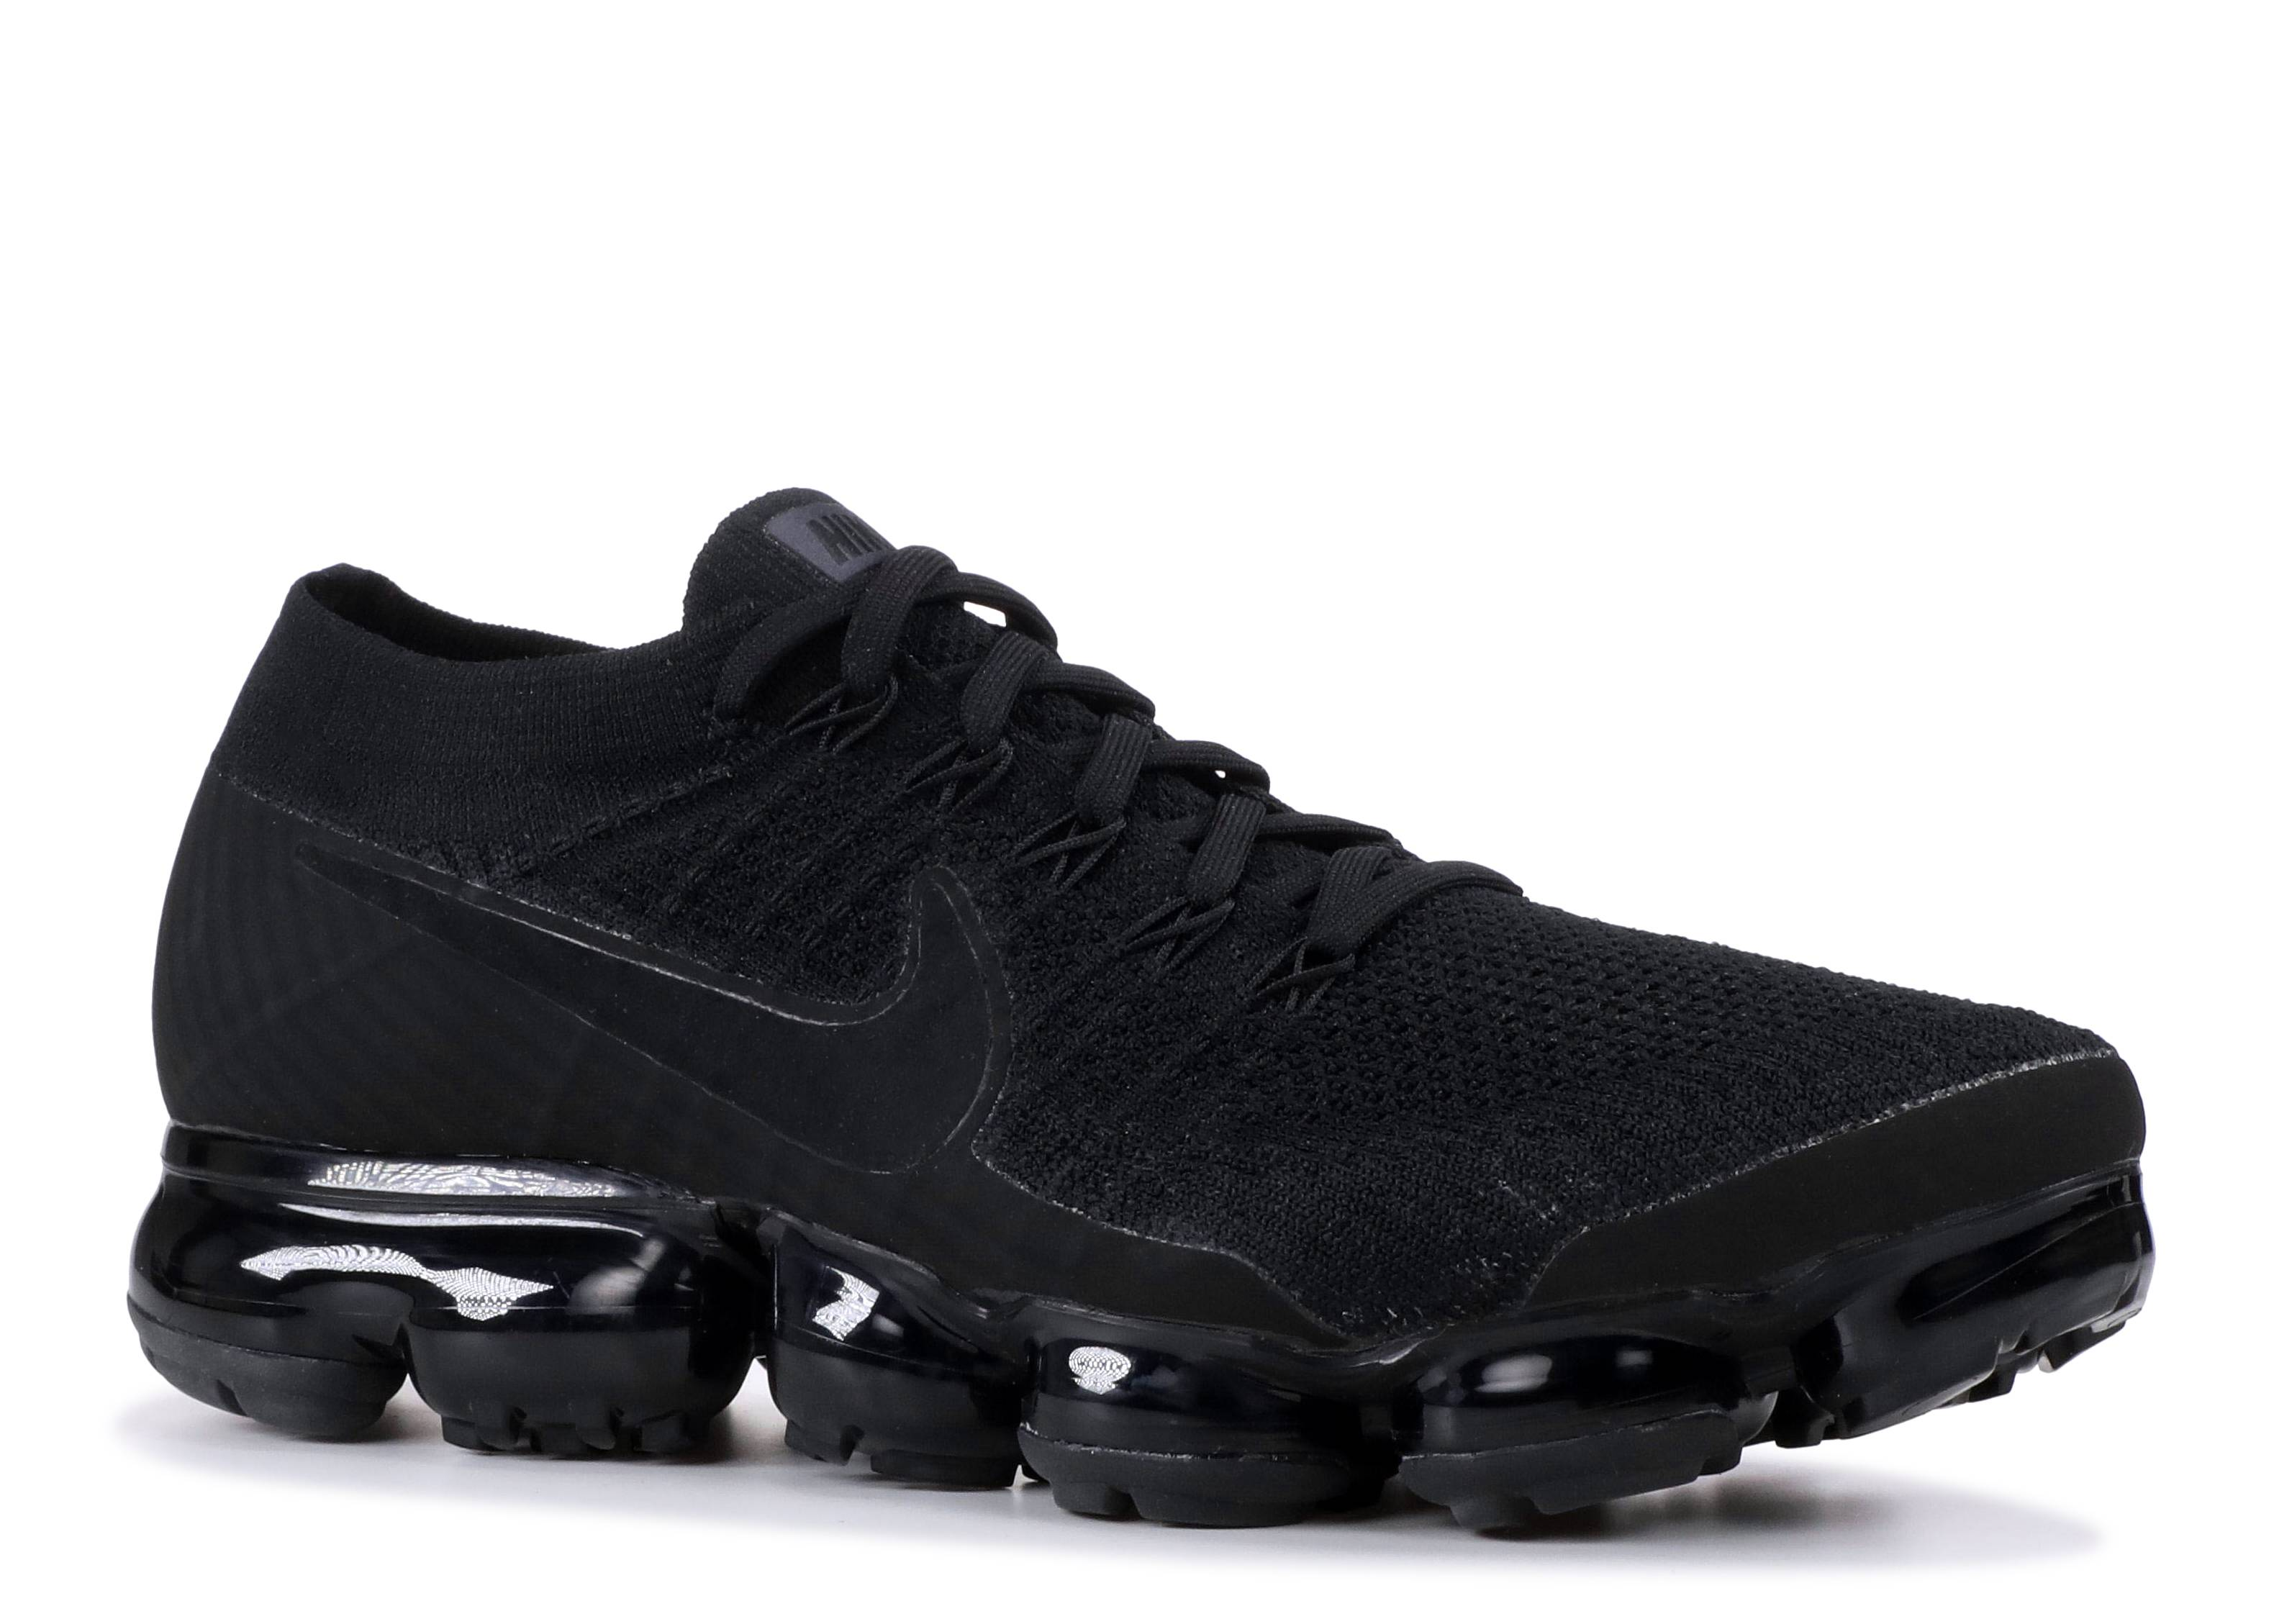 65a77cdaeba Nike Air Vapormax Triple Black 3.0 - 1